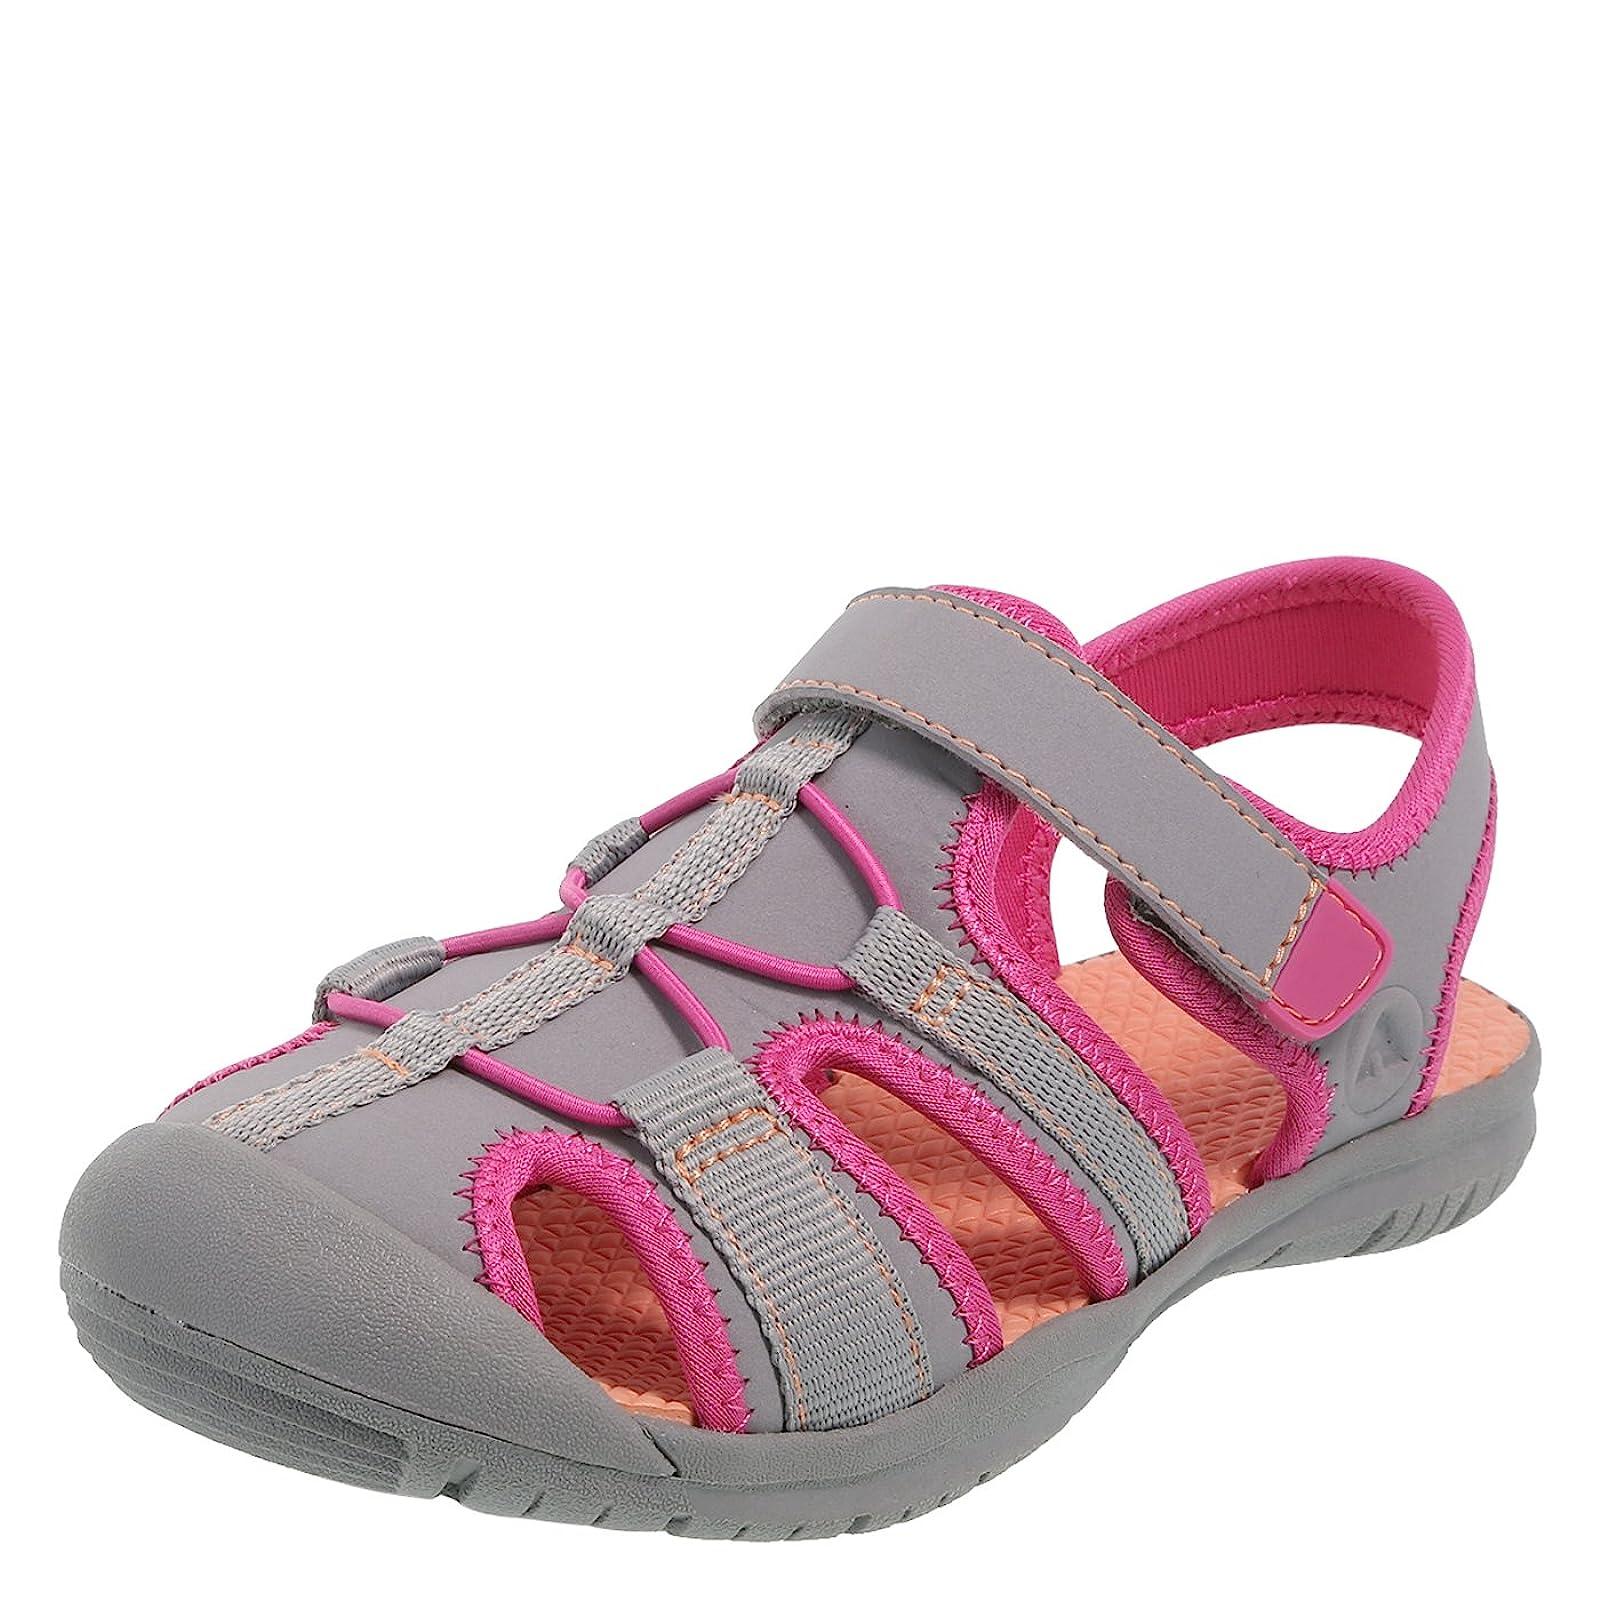 Rugged Outback Grey Pink Girls' Marina Bumptoe 175191040 - 4